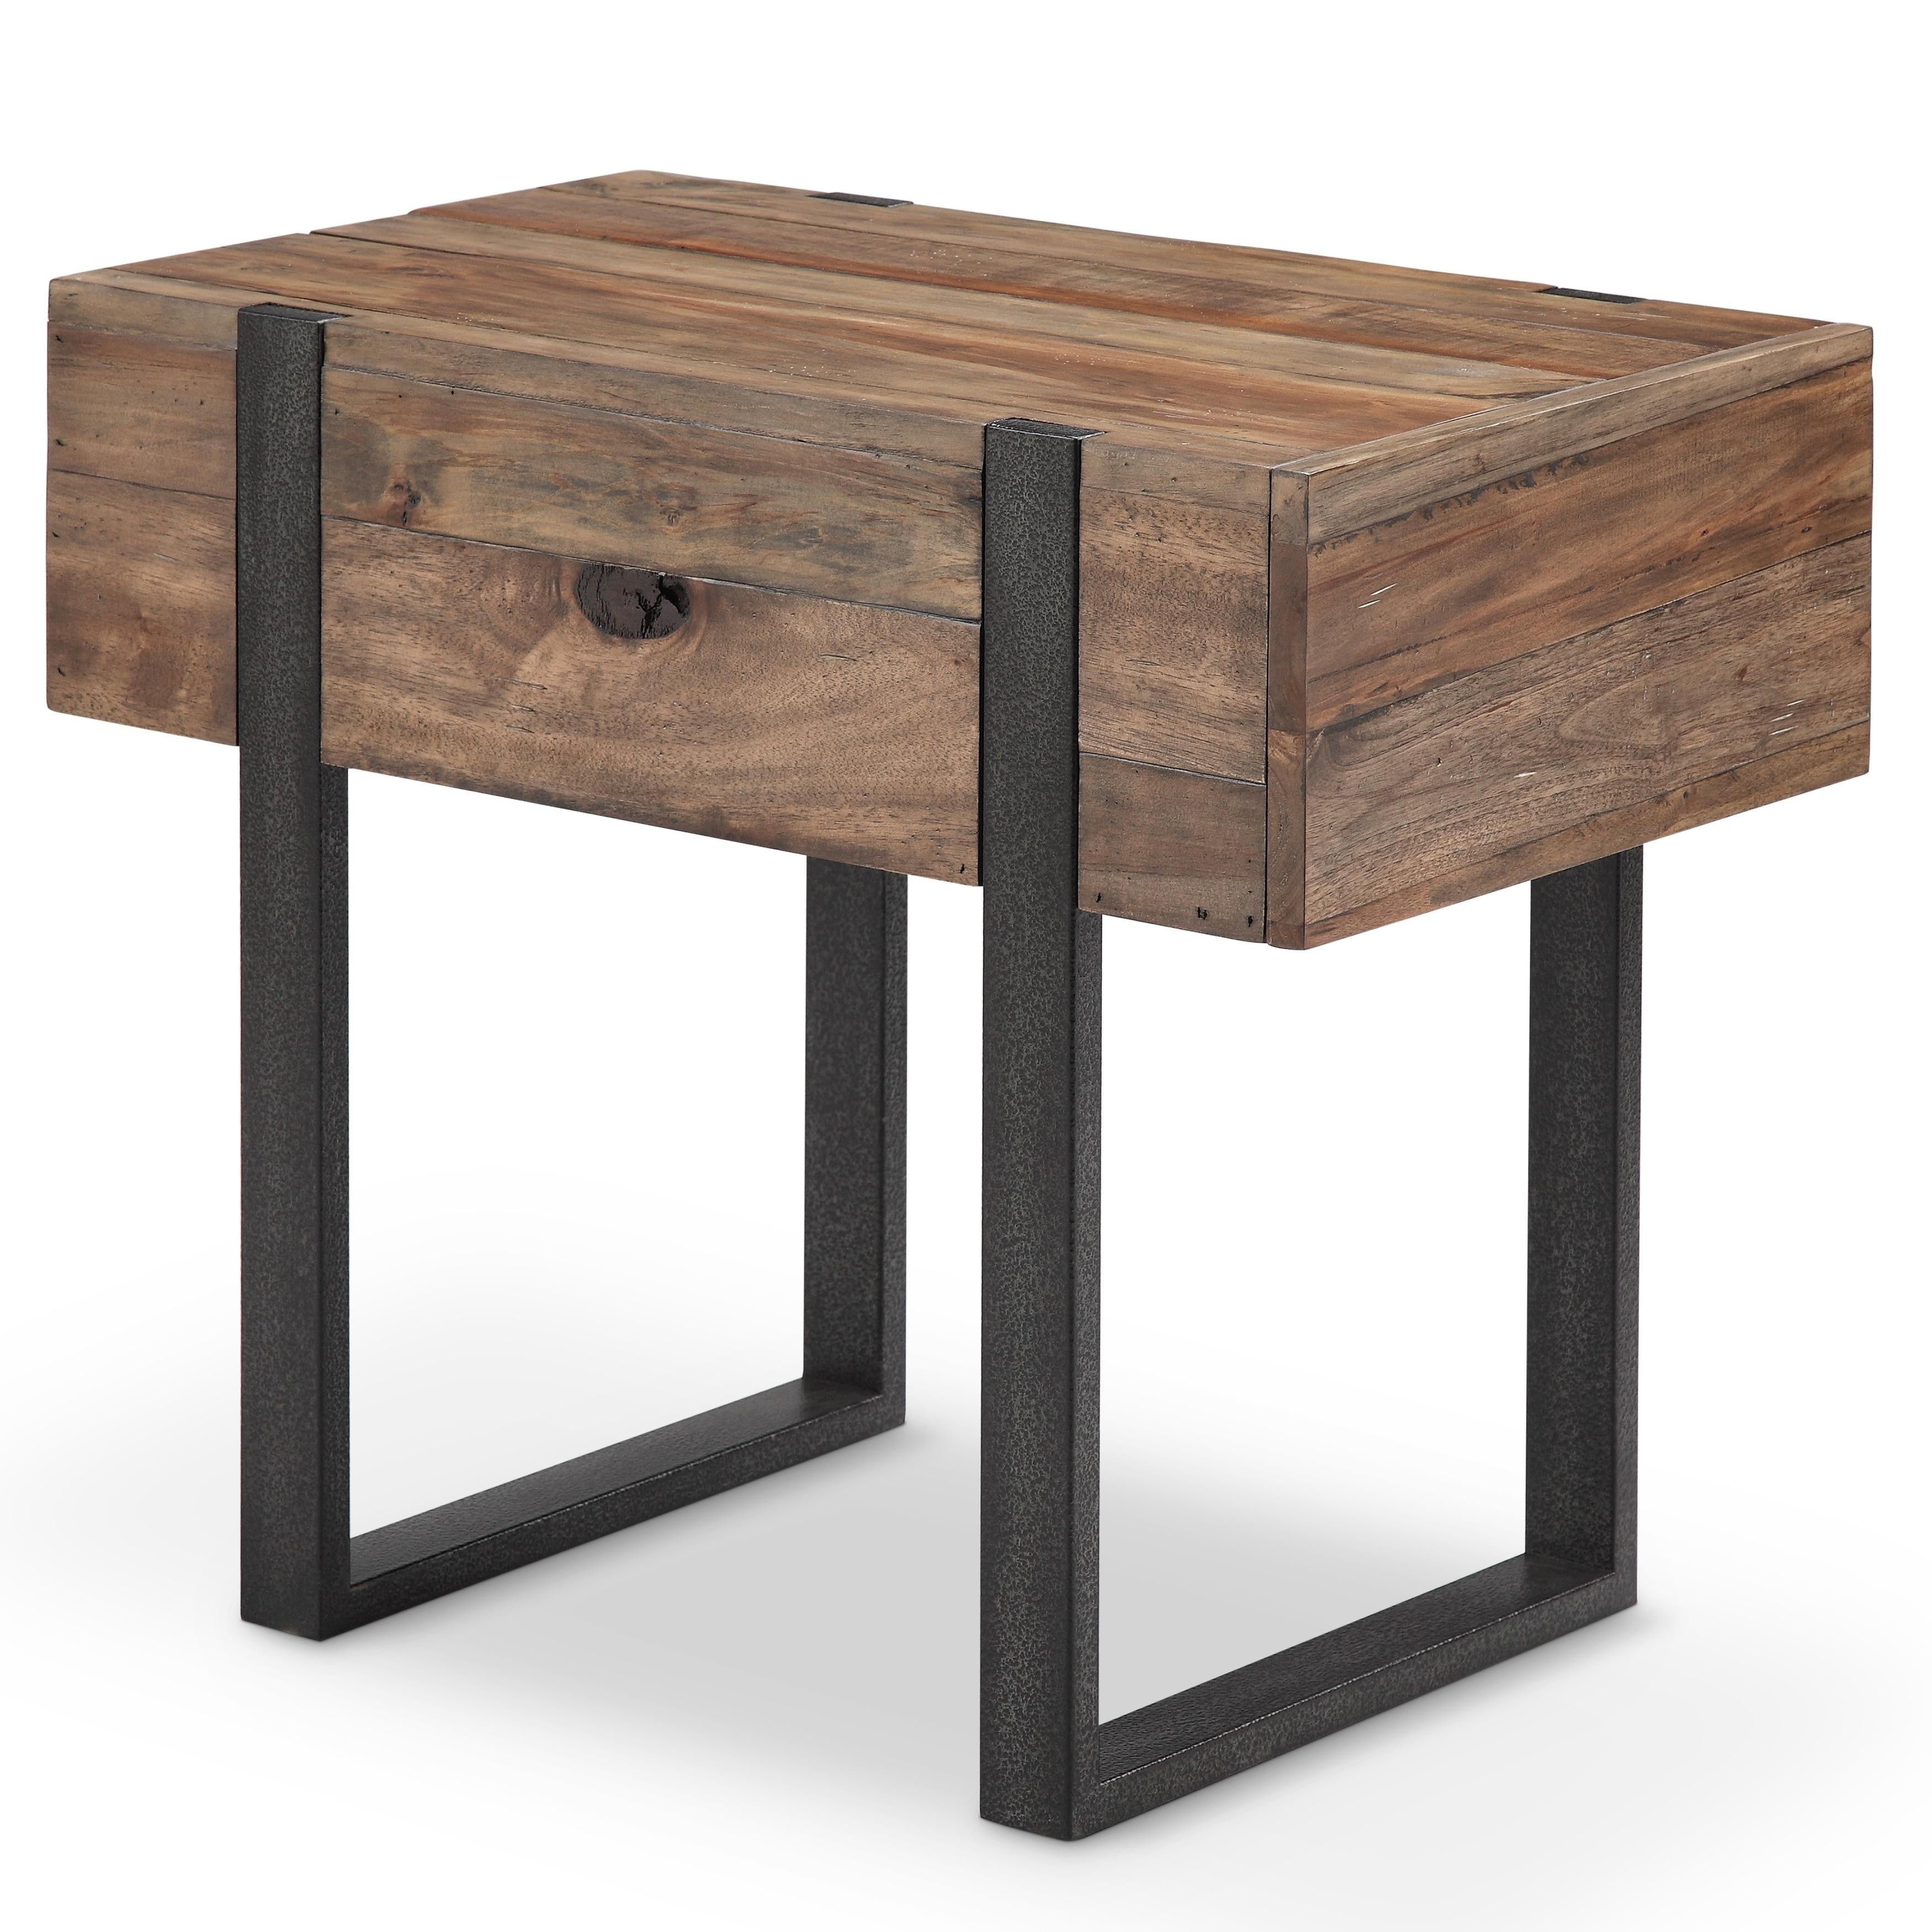 Prescott Modern Reclaimed Wood In Rustic Honey Chairside End Table Overstock 16939897